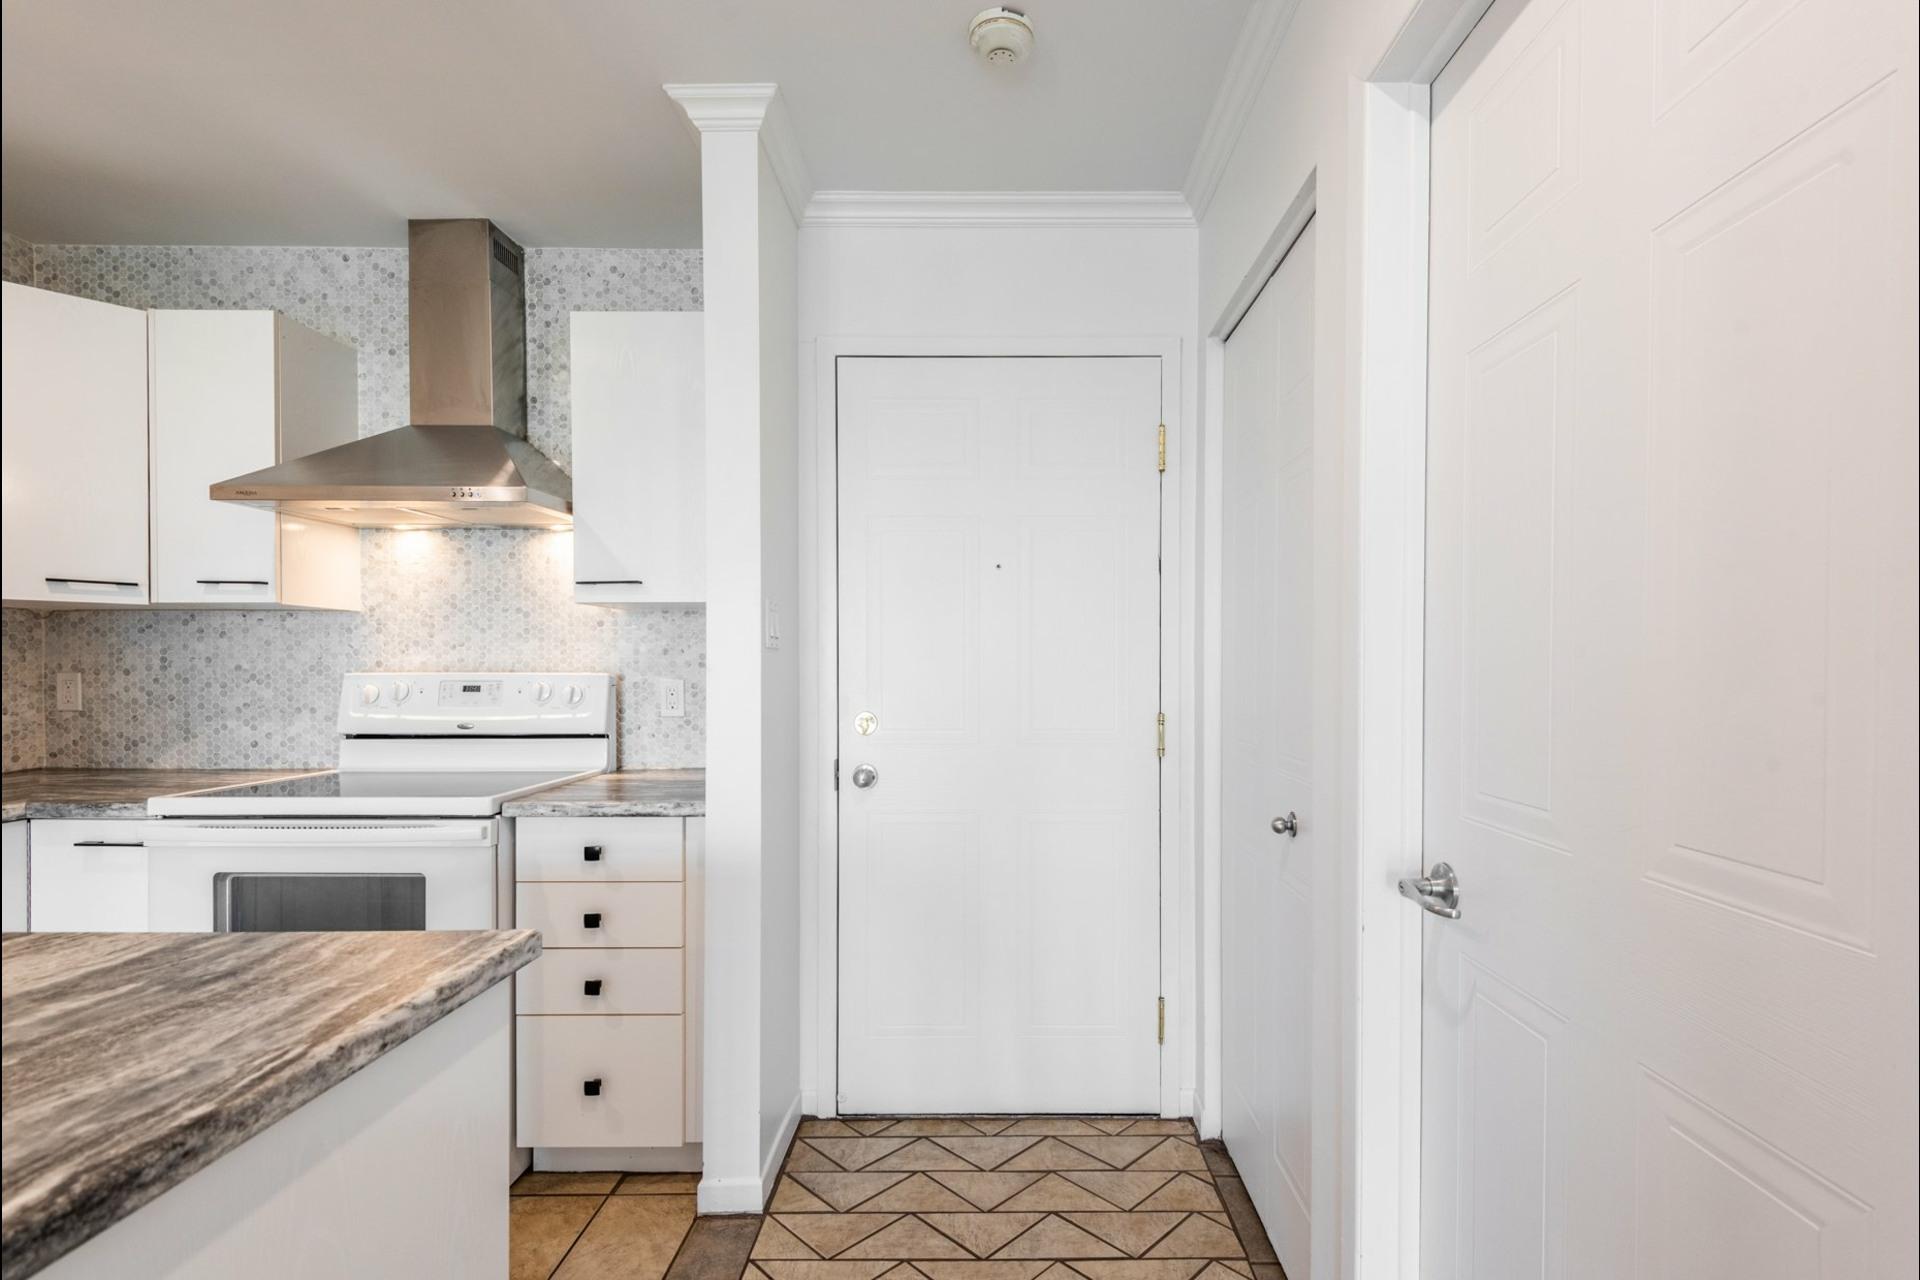 image 5 - Apartment For sale Saint-Hubert Longueuil  - 4 rooms